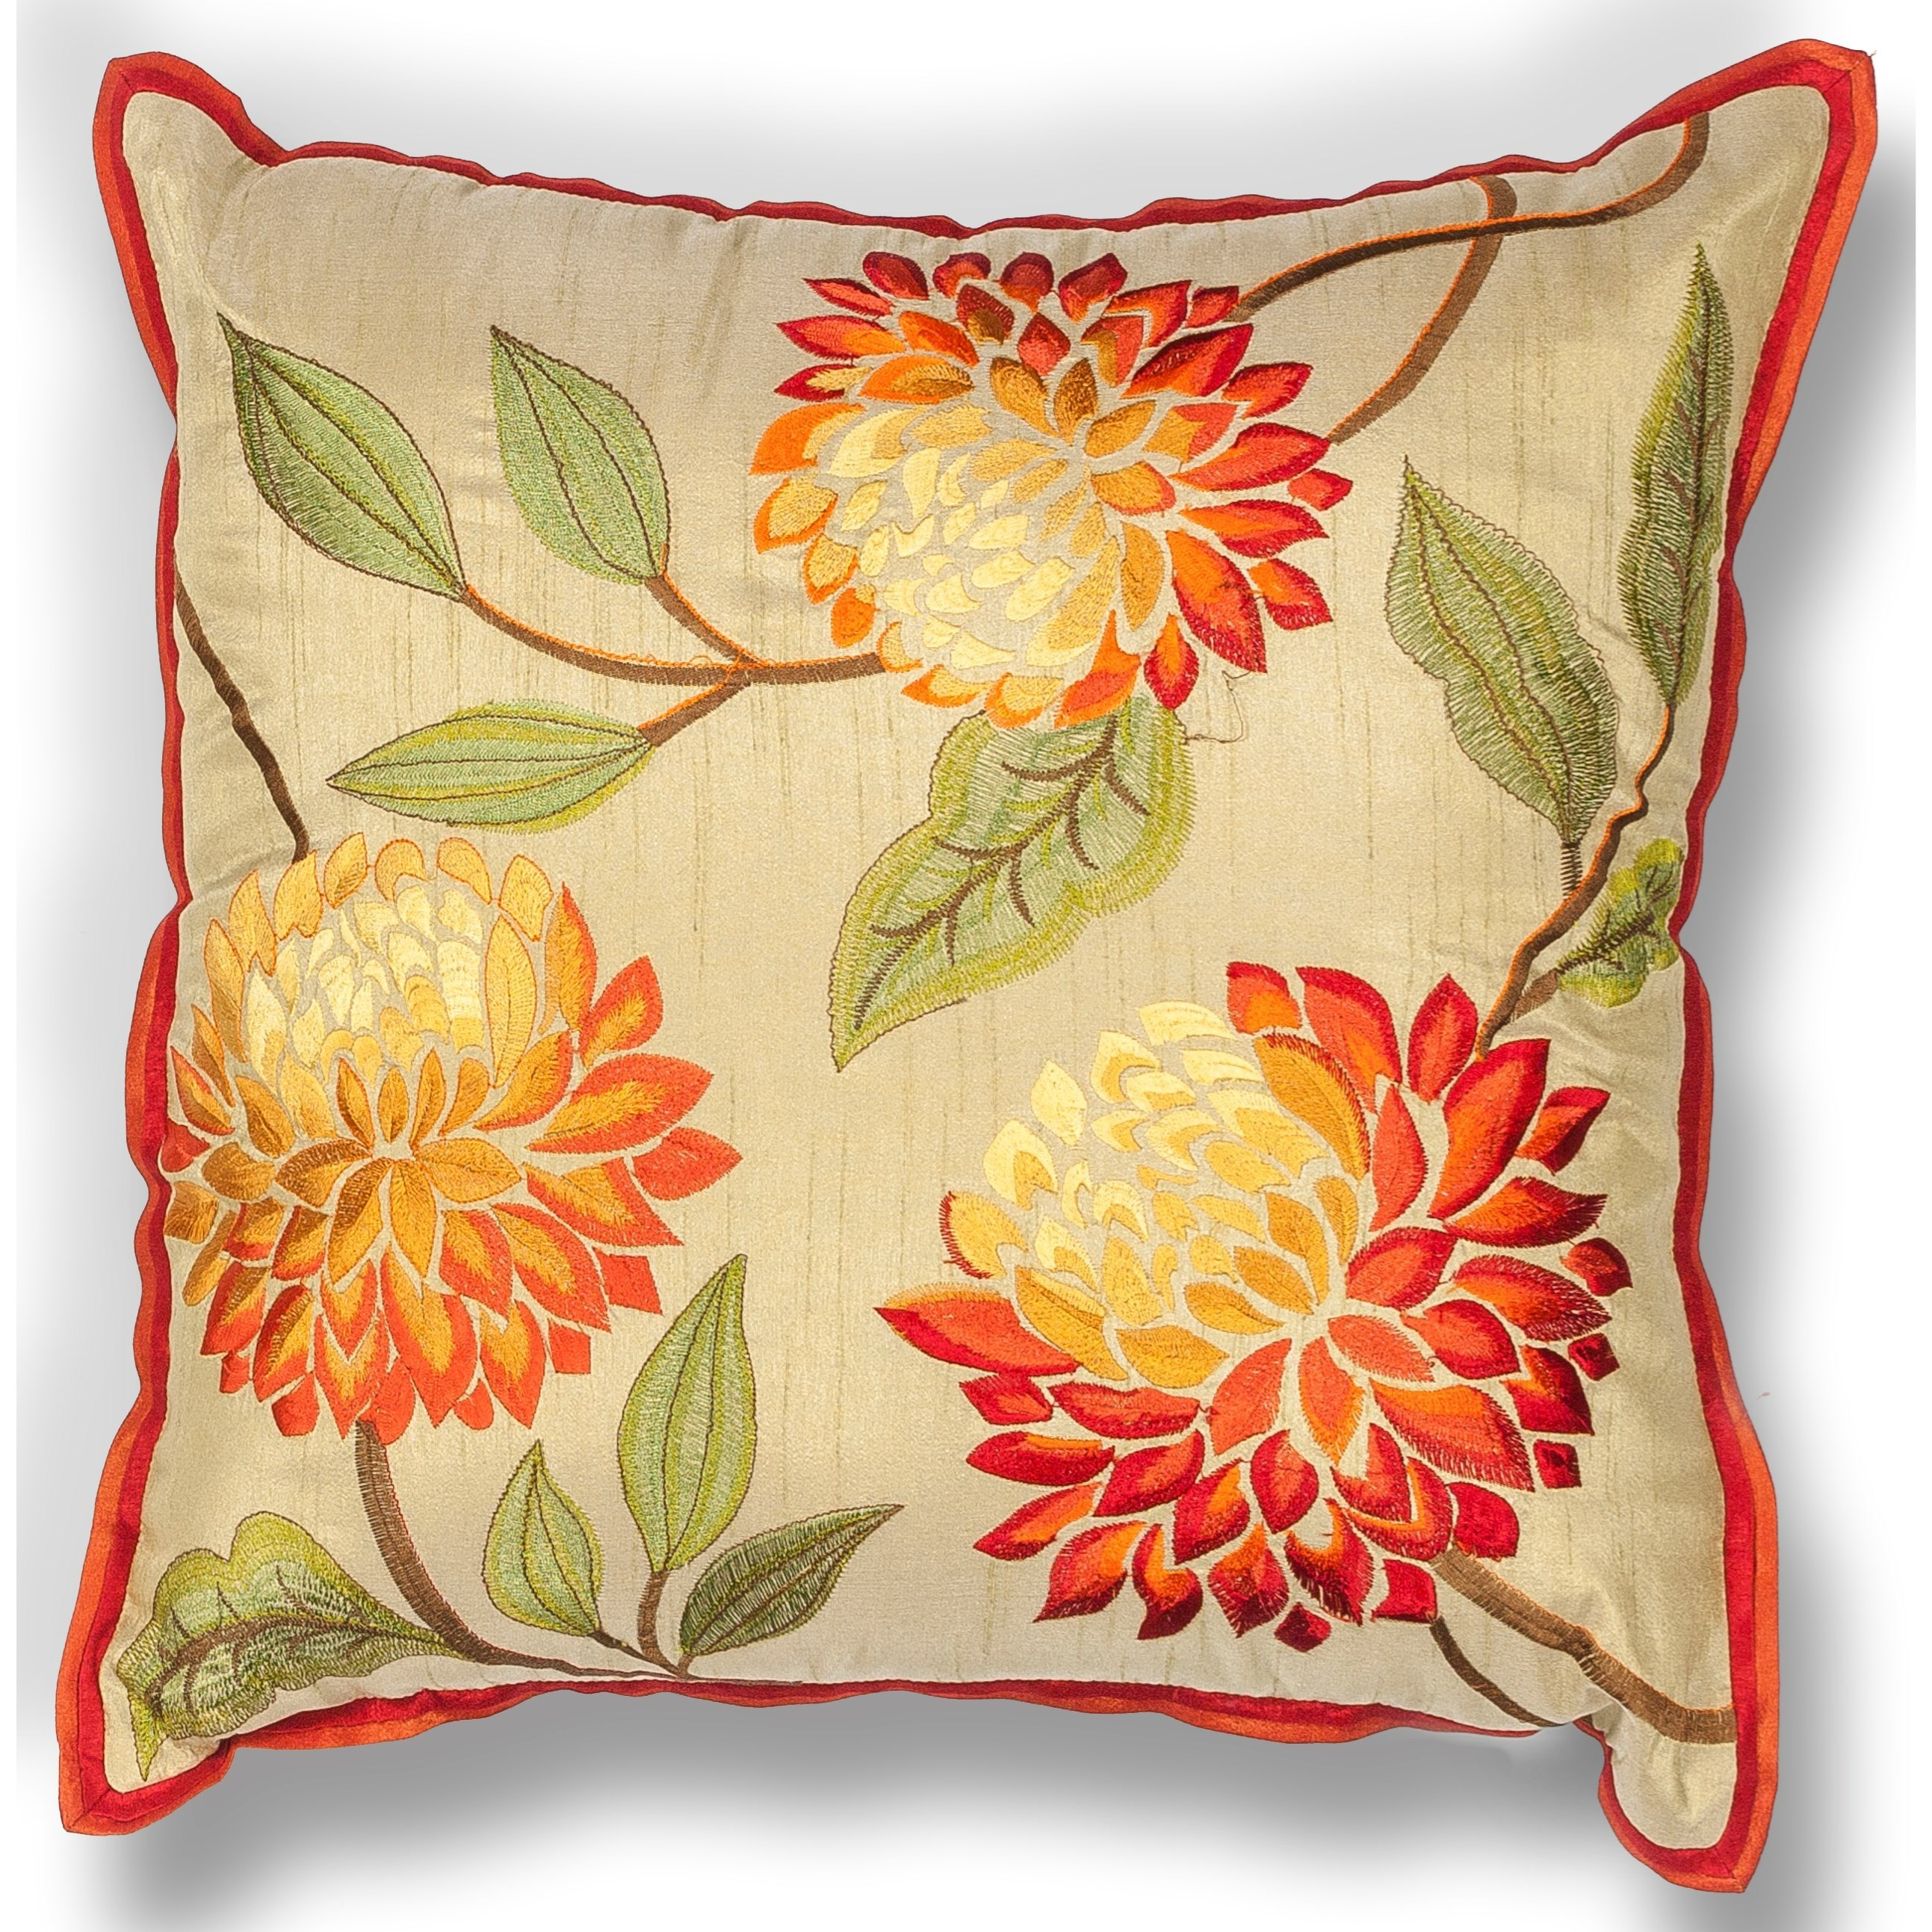 "Pillow 18"" X 18"" Red Chrysanthemum Pillows by Kas at Zak's Home"